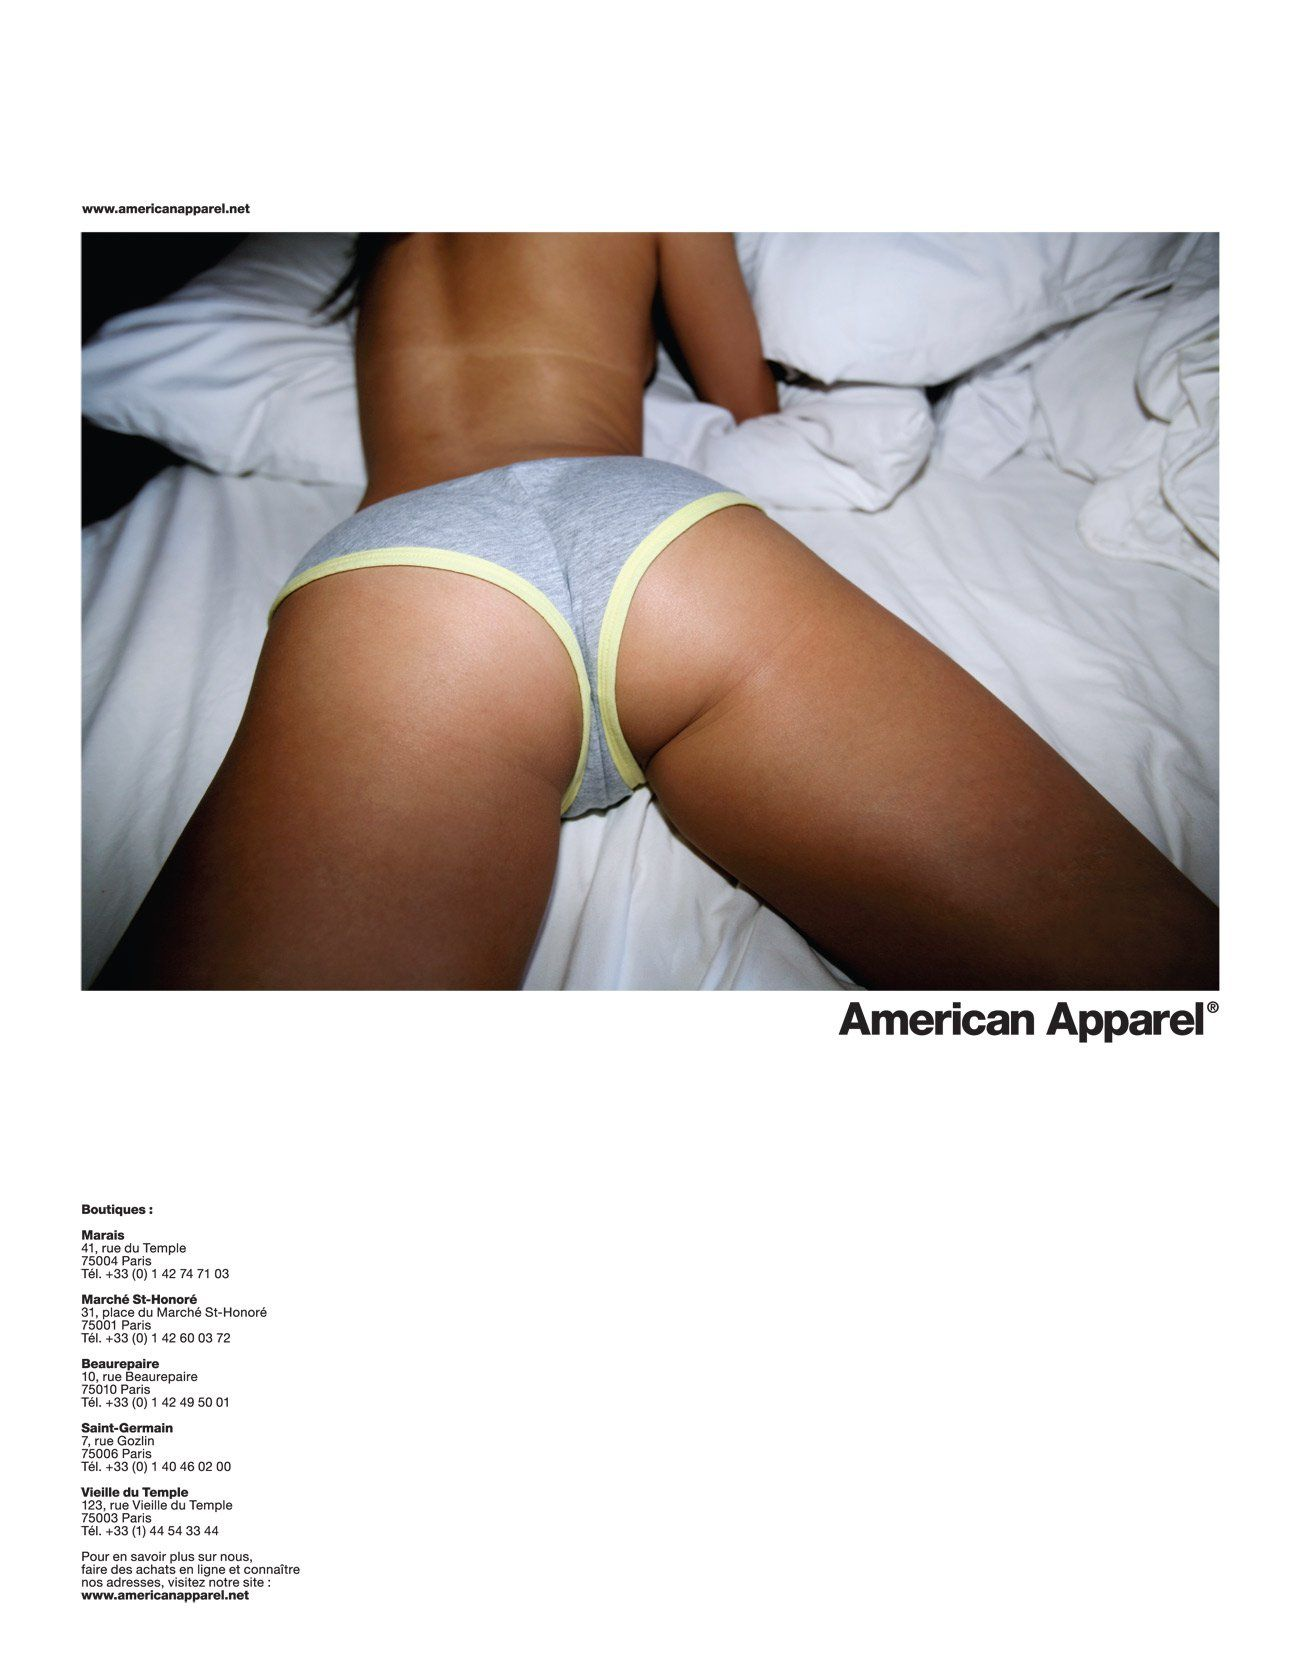 American Apparel Ad France Tappanties 180907 Jpg 1300 1672